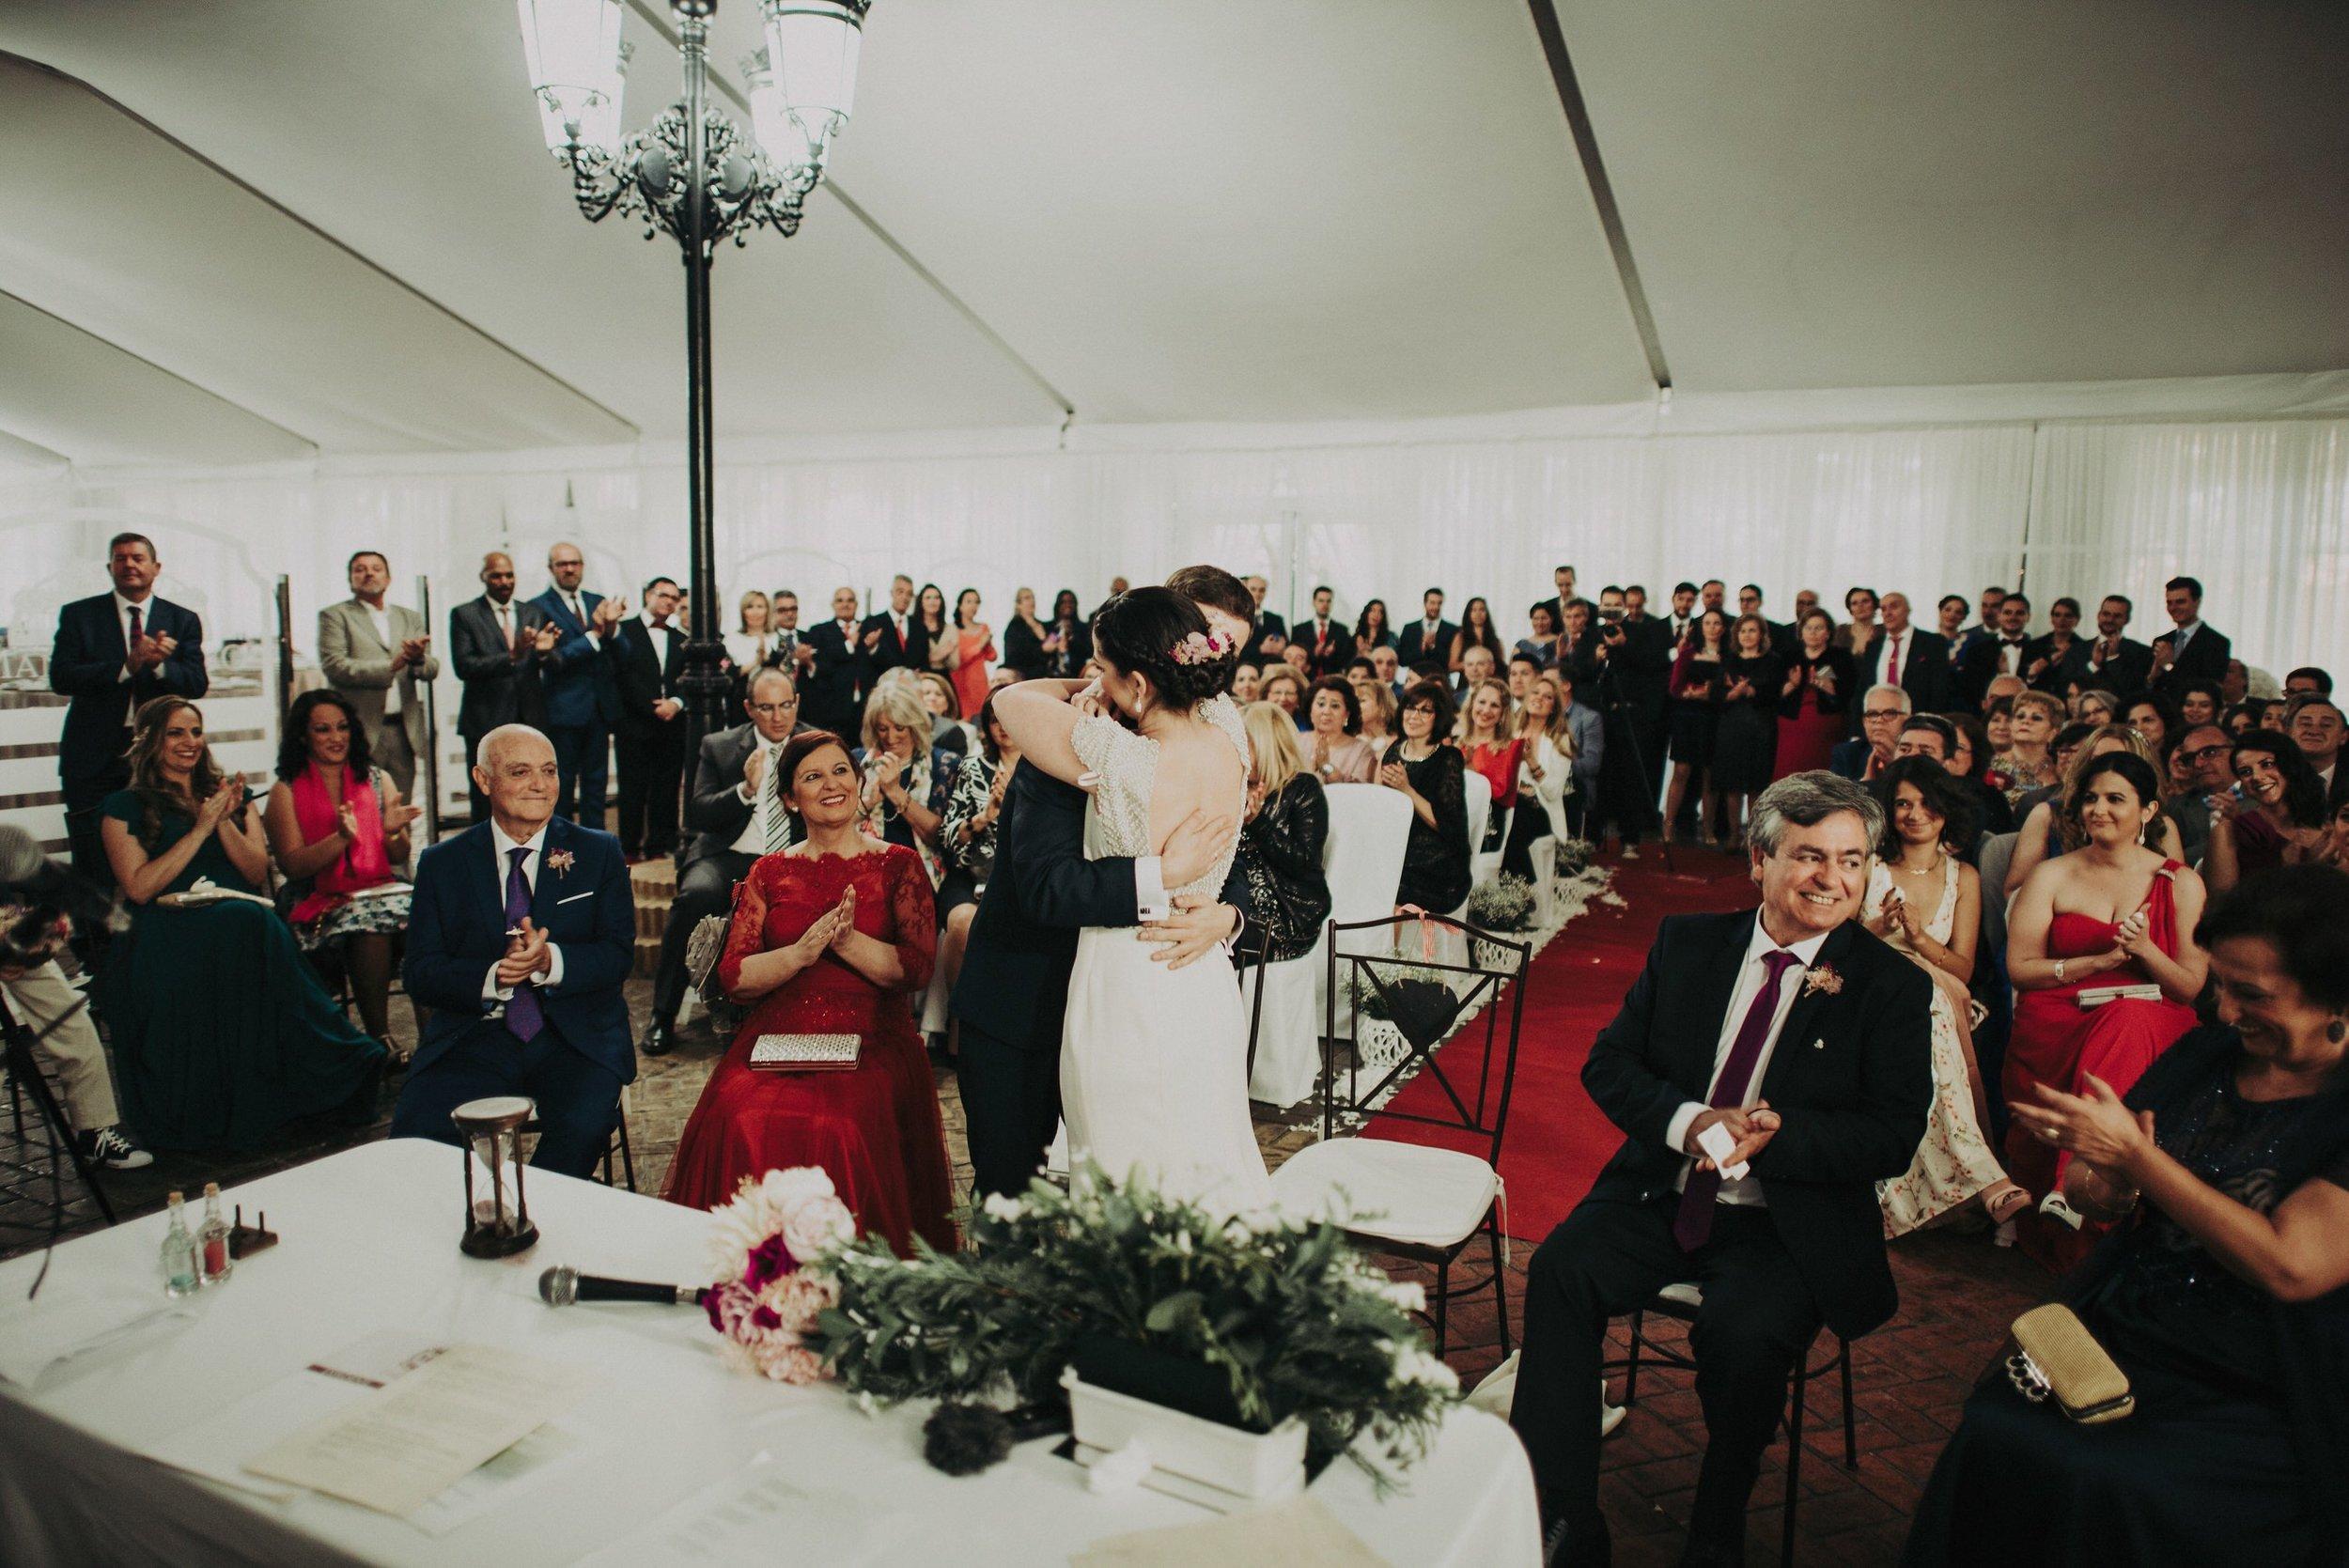 Laura & Rubén - boda en utrera - Santa clotilde- Manolo mayo - Fotografo de boda - Andrés Amarillo AAA_1075-Exposure (28).jpg